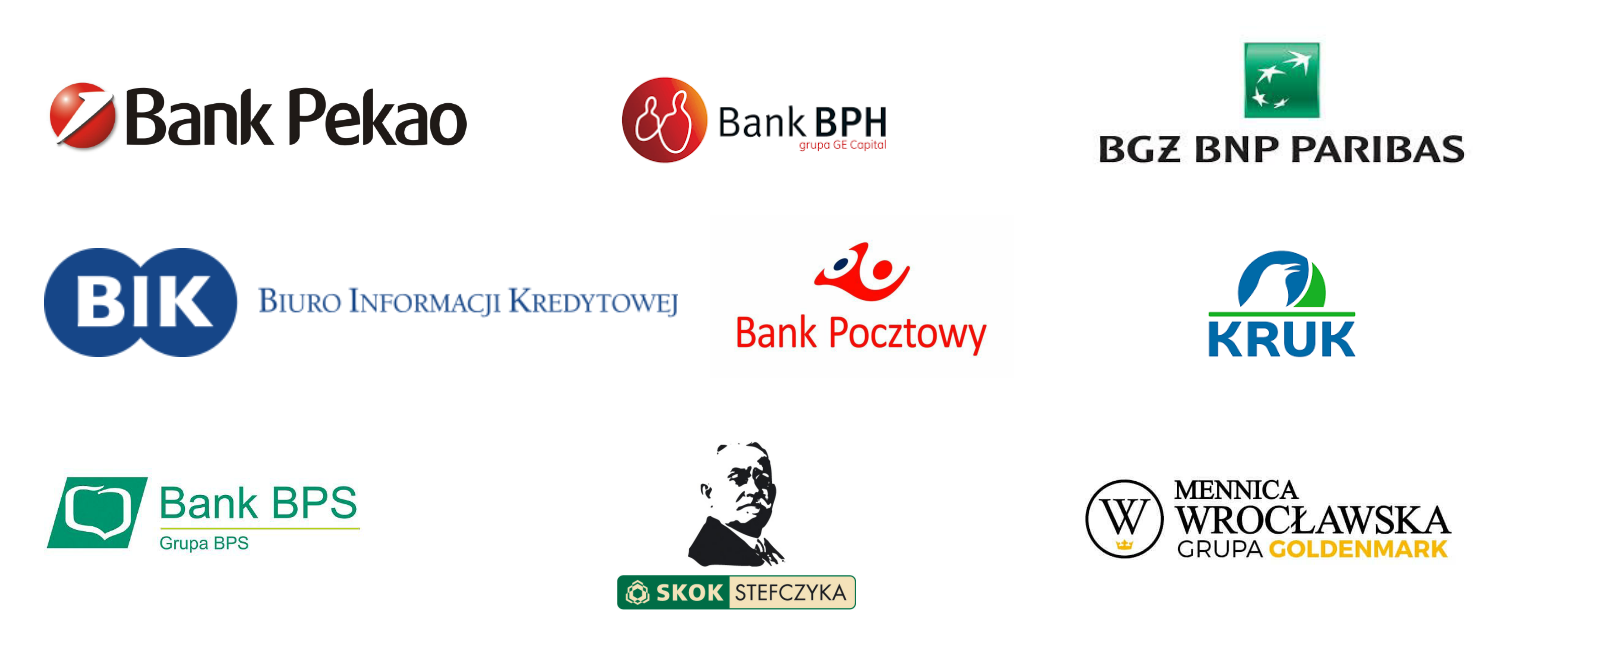 Logotypy finanse